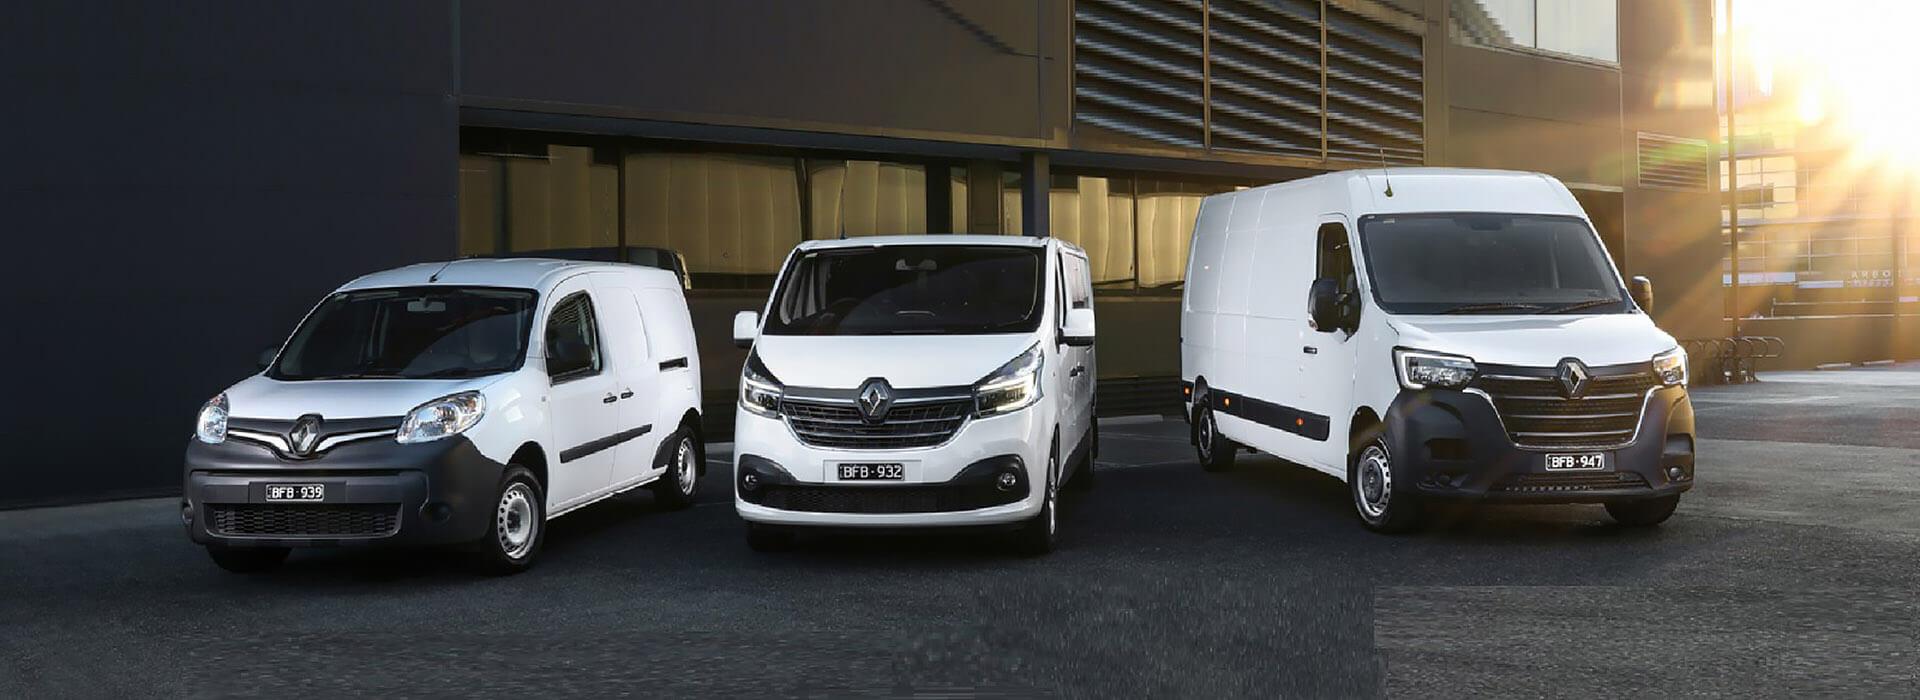 Trinity Renault Fleet